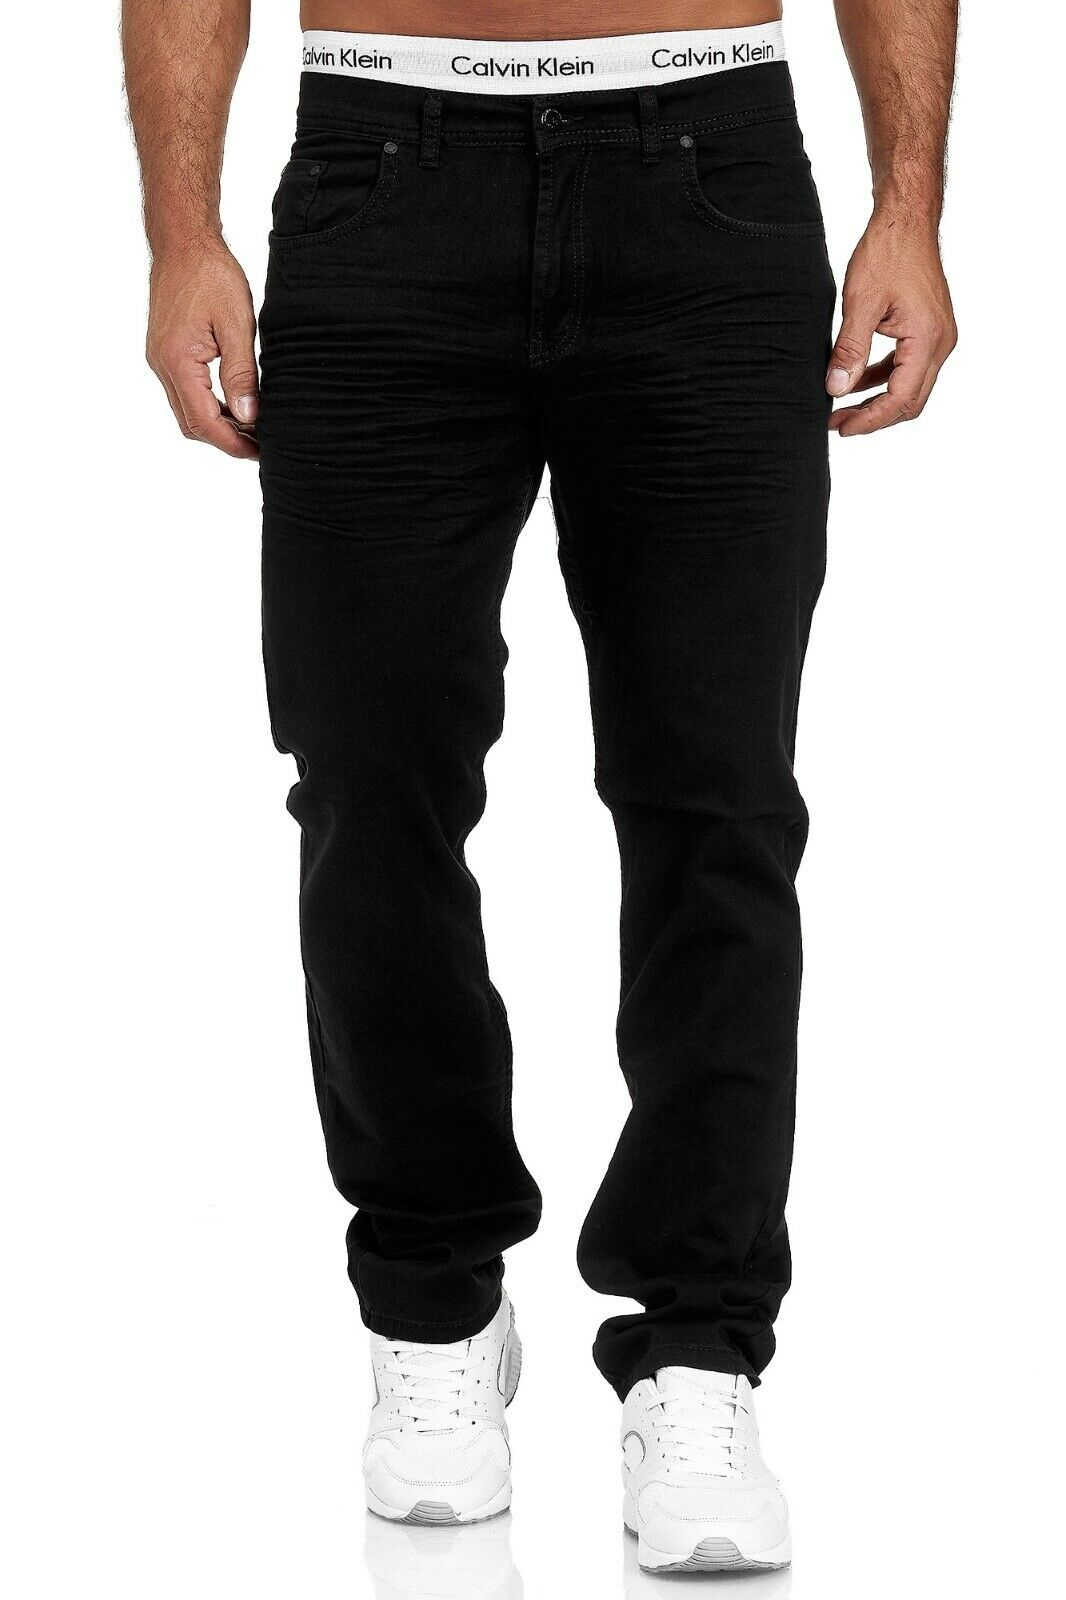 Herren-Jeans-Hose-Denim-KC-Black-Washed-Straight-Cut-Regular-Dicke-Naht-naehte Indexbild 76